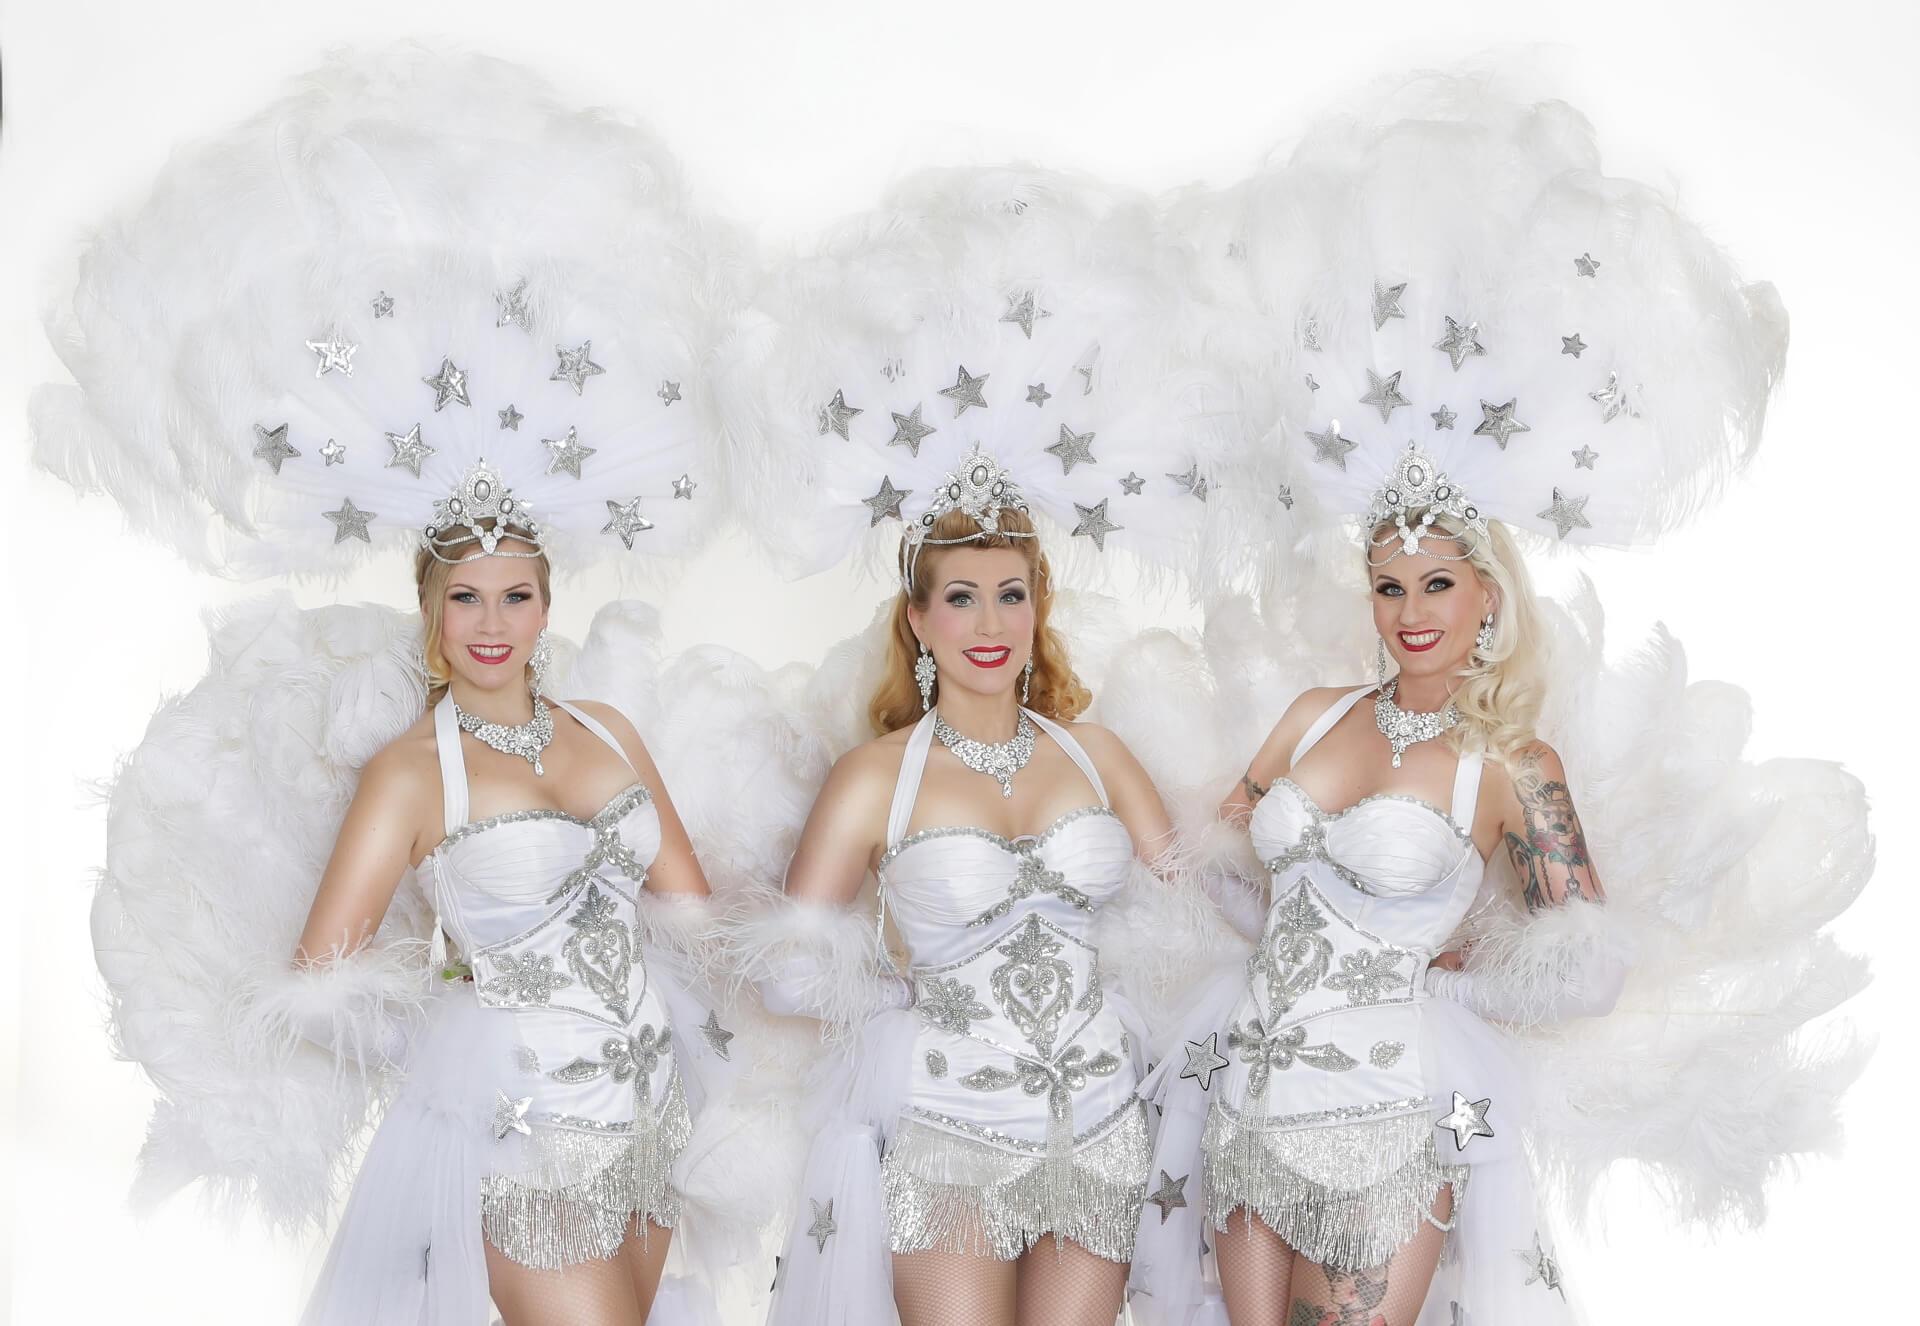 Burlesque Show buchen Burlesque Tänzerin Blonde Bombshell Burlesque München